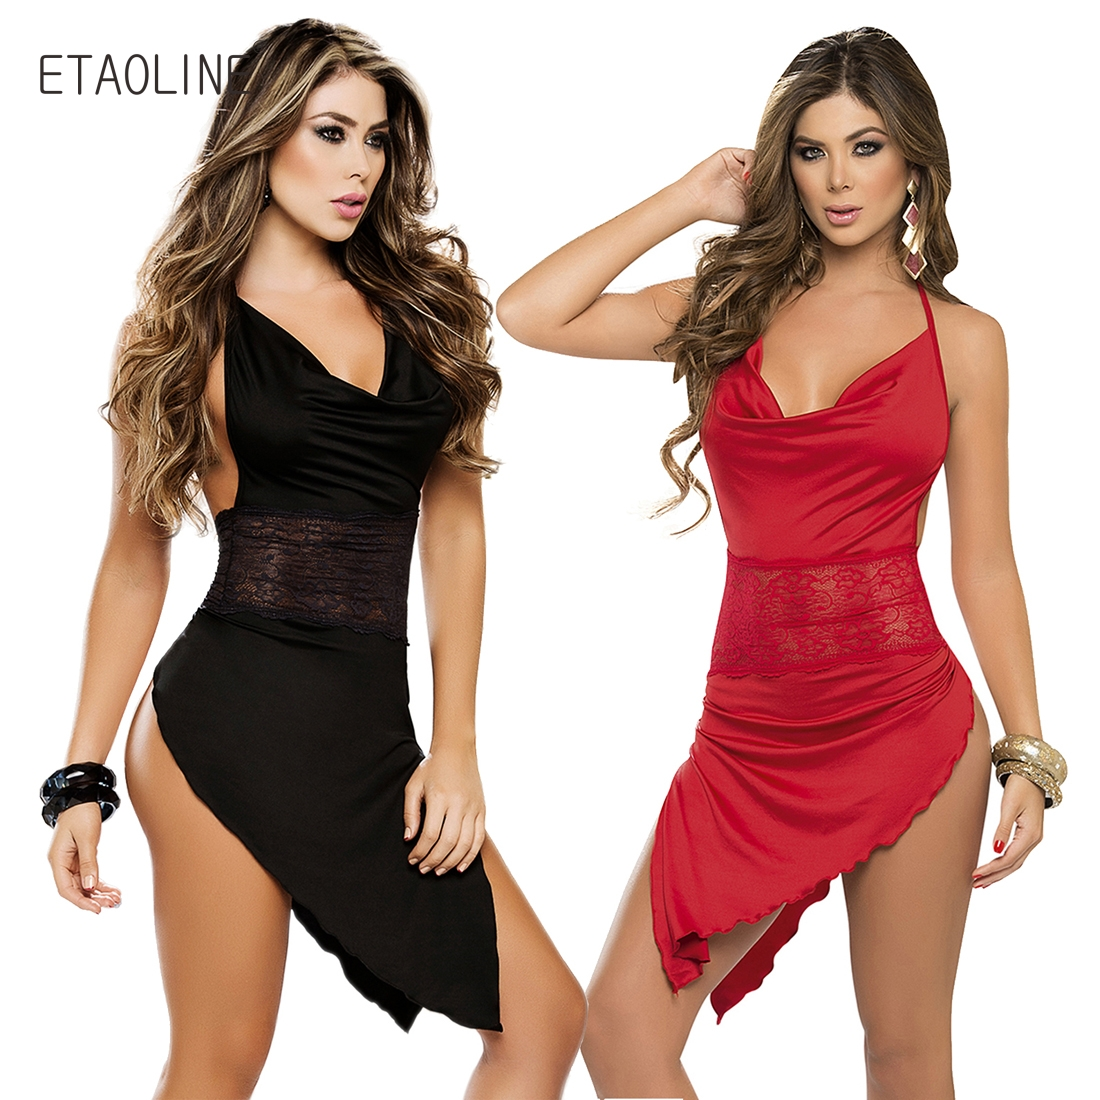 ETAOLINE 2018 Sexy Deep V-Neck Lingerie Women Balck Perspective Gauze Lace Splice Chemise&Babydoll Erotic Lingerie Sexy Costumes